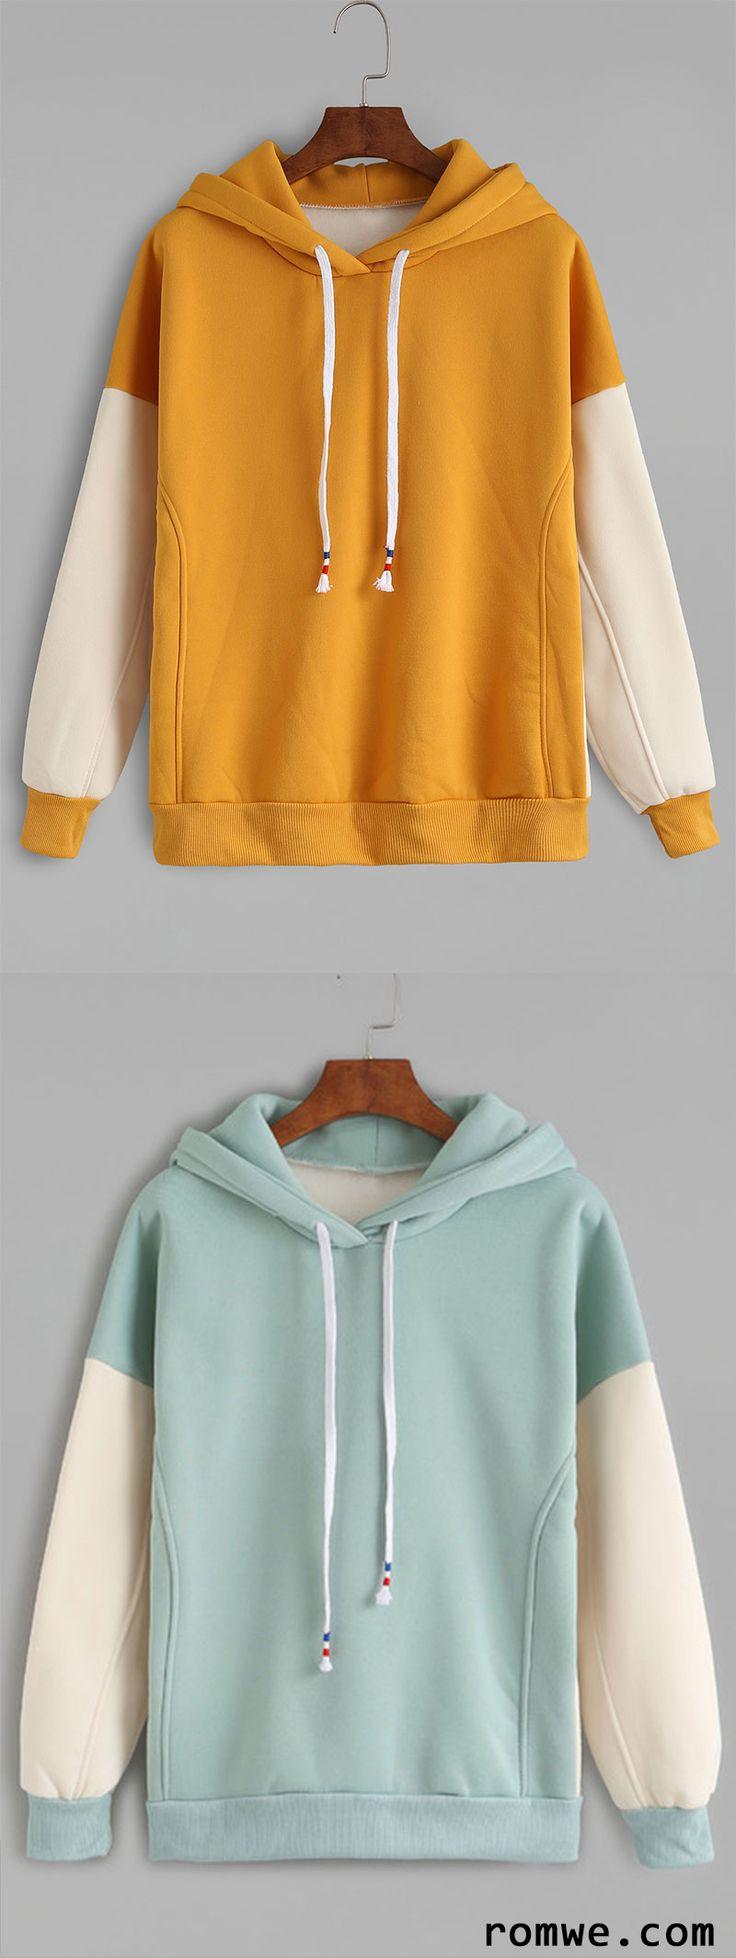 Mustard Contrast Sleeve Drawstring Hooded Sweatshirt http://amzn.to/2k2HTMQ  Celui en bleu est juste magnifique